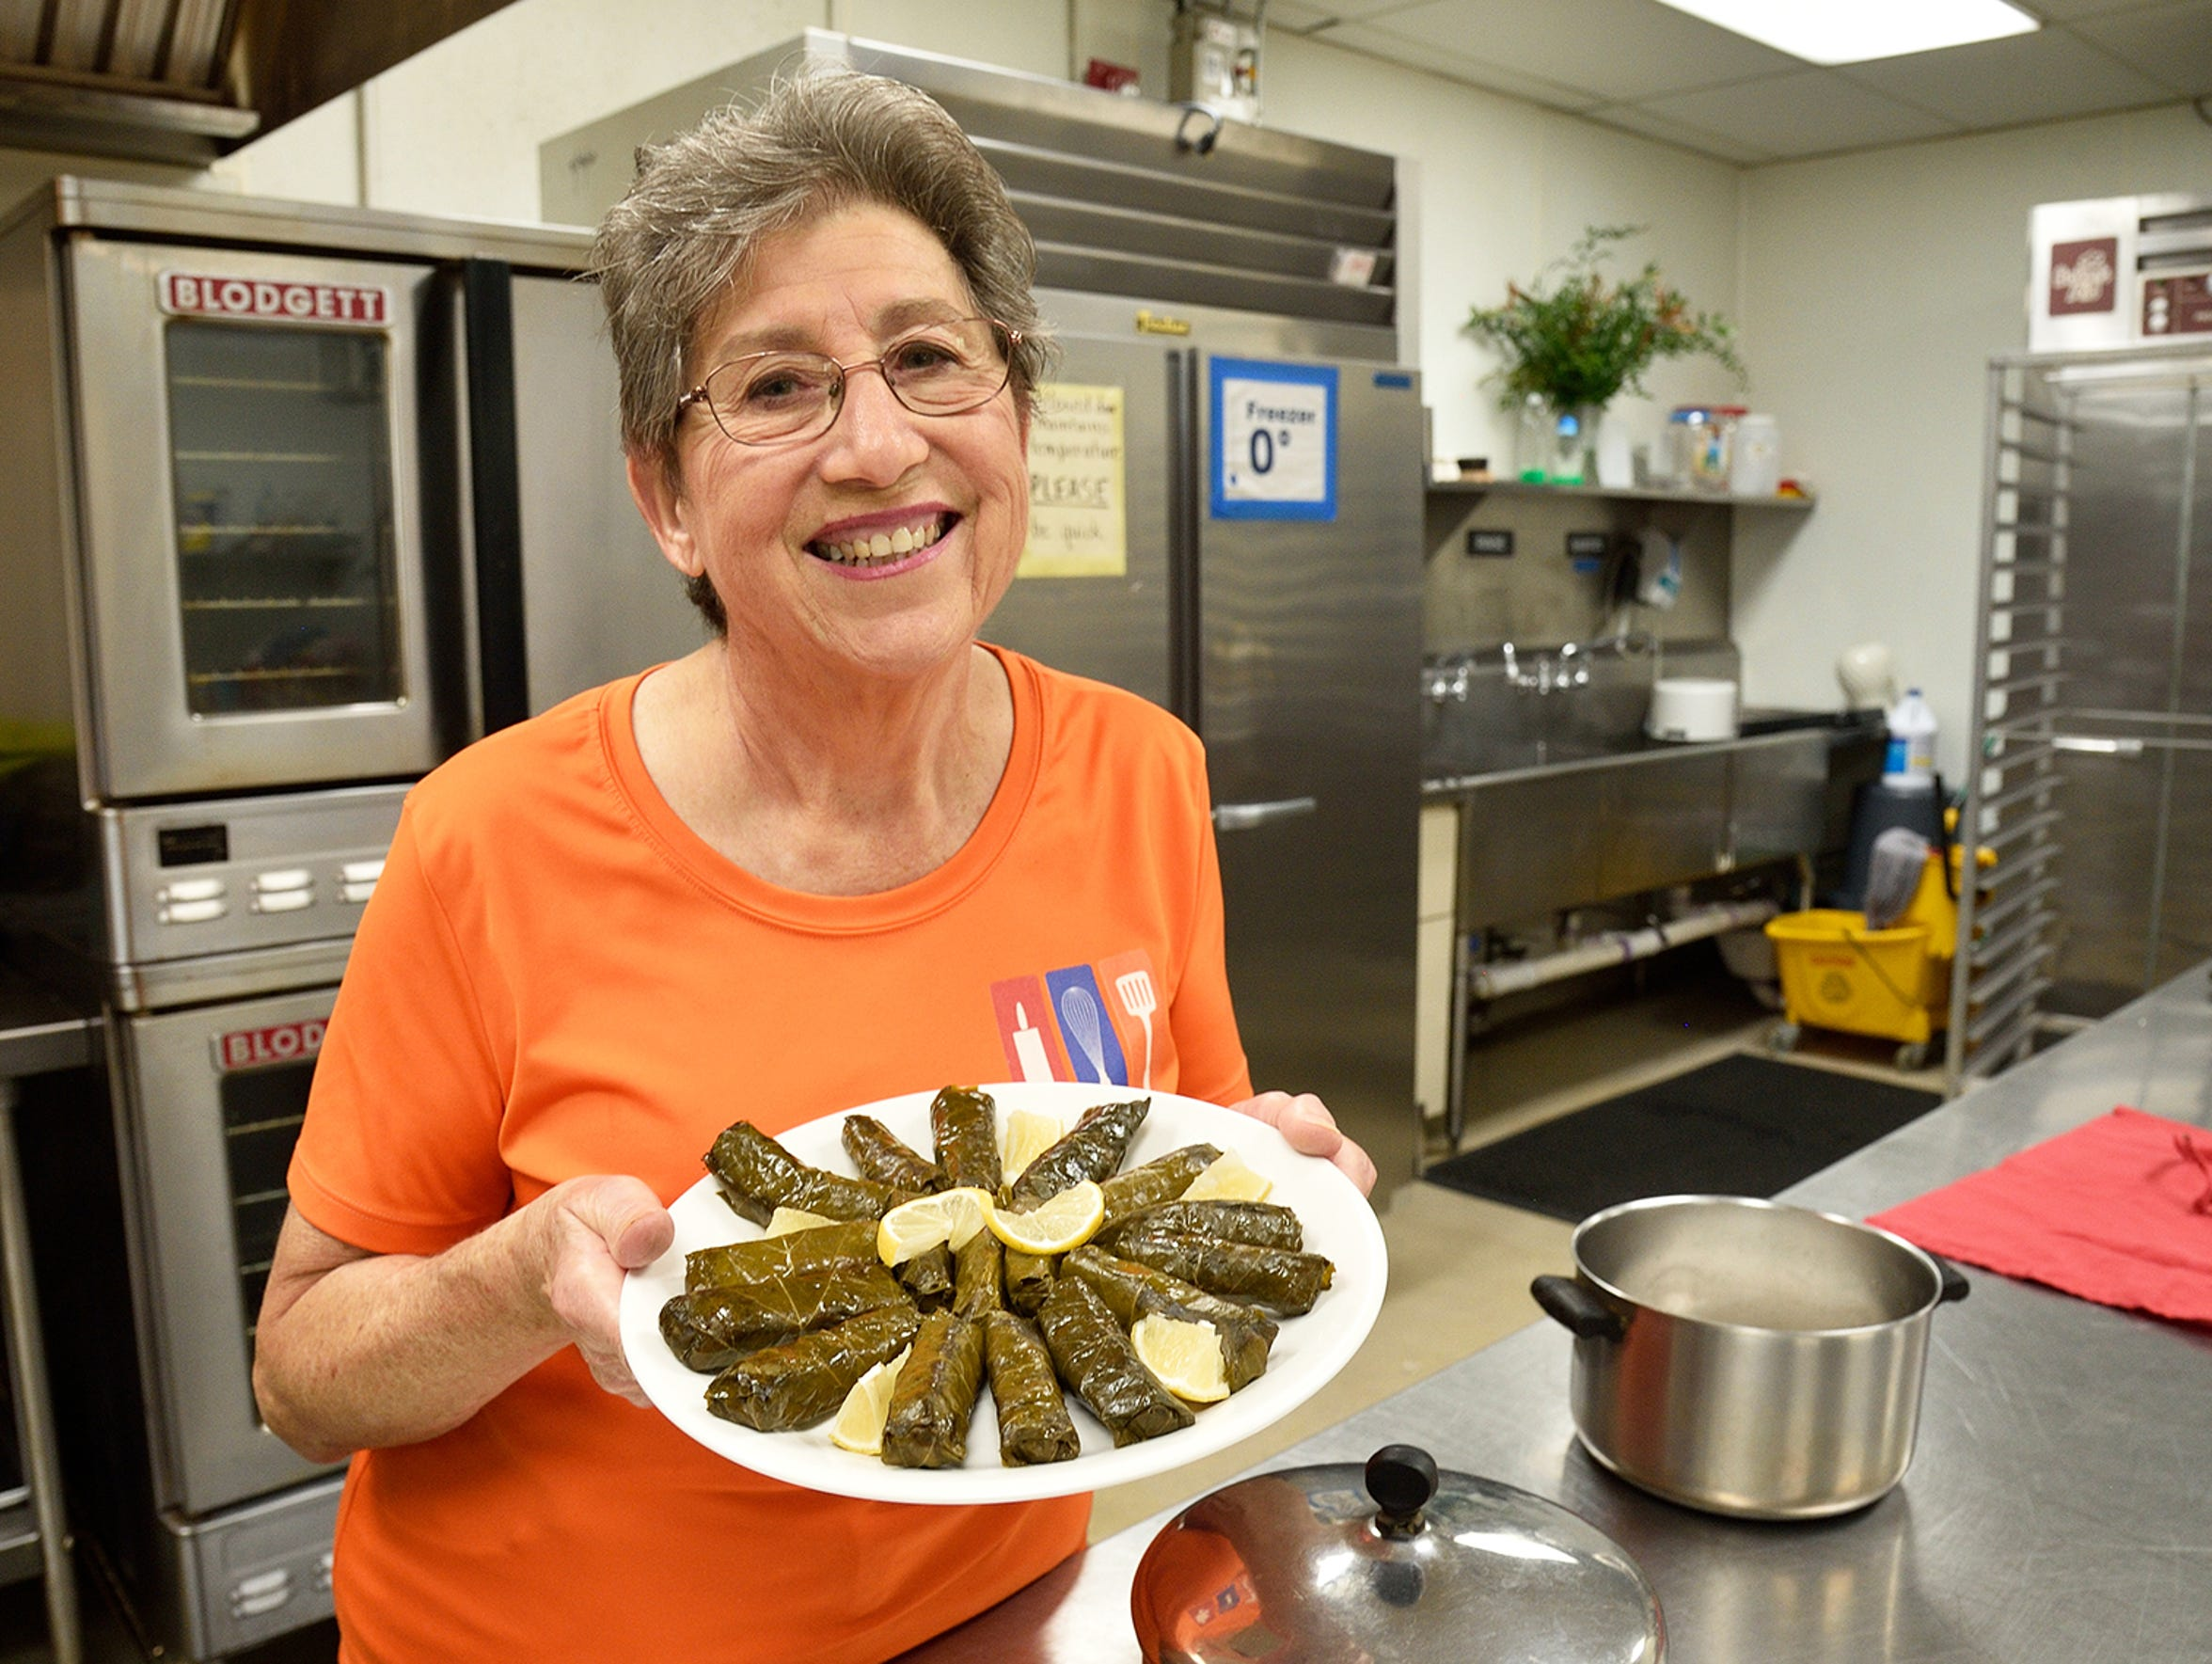 Barbara Hovsepian of the St. Leon Armenian Church in Fair Lawn shows off her Yalanchi in the kitchen of the church.